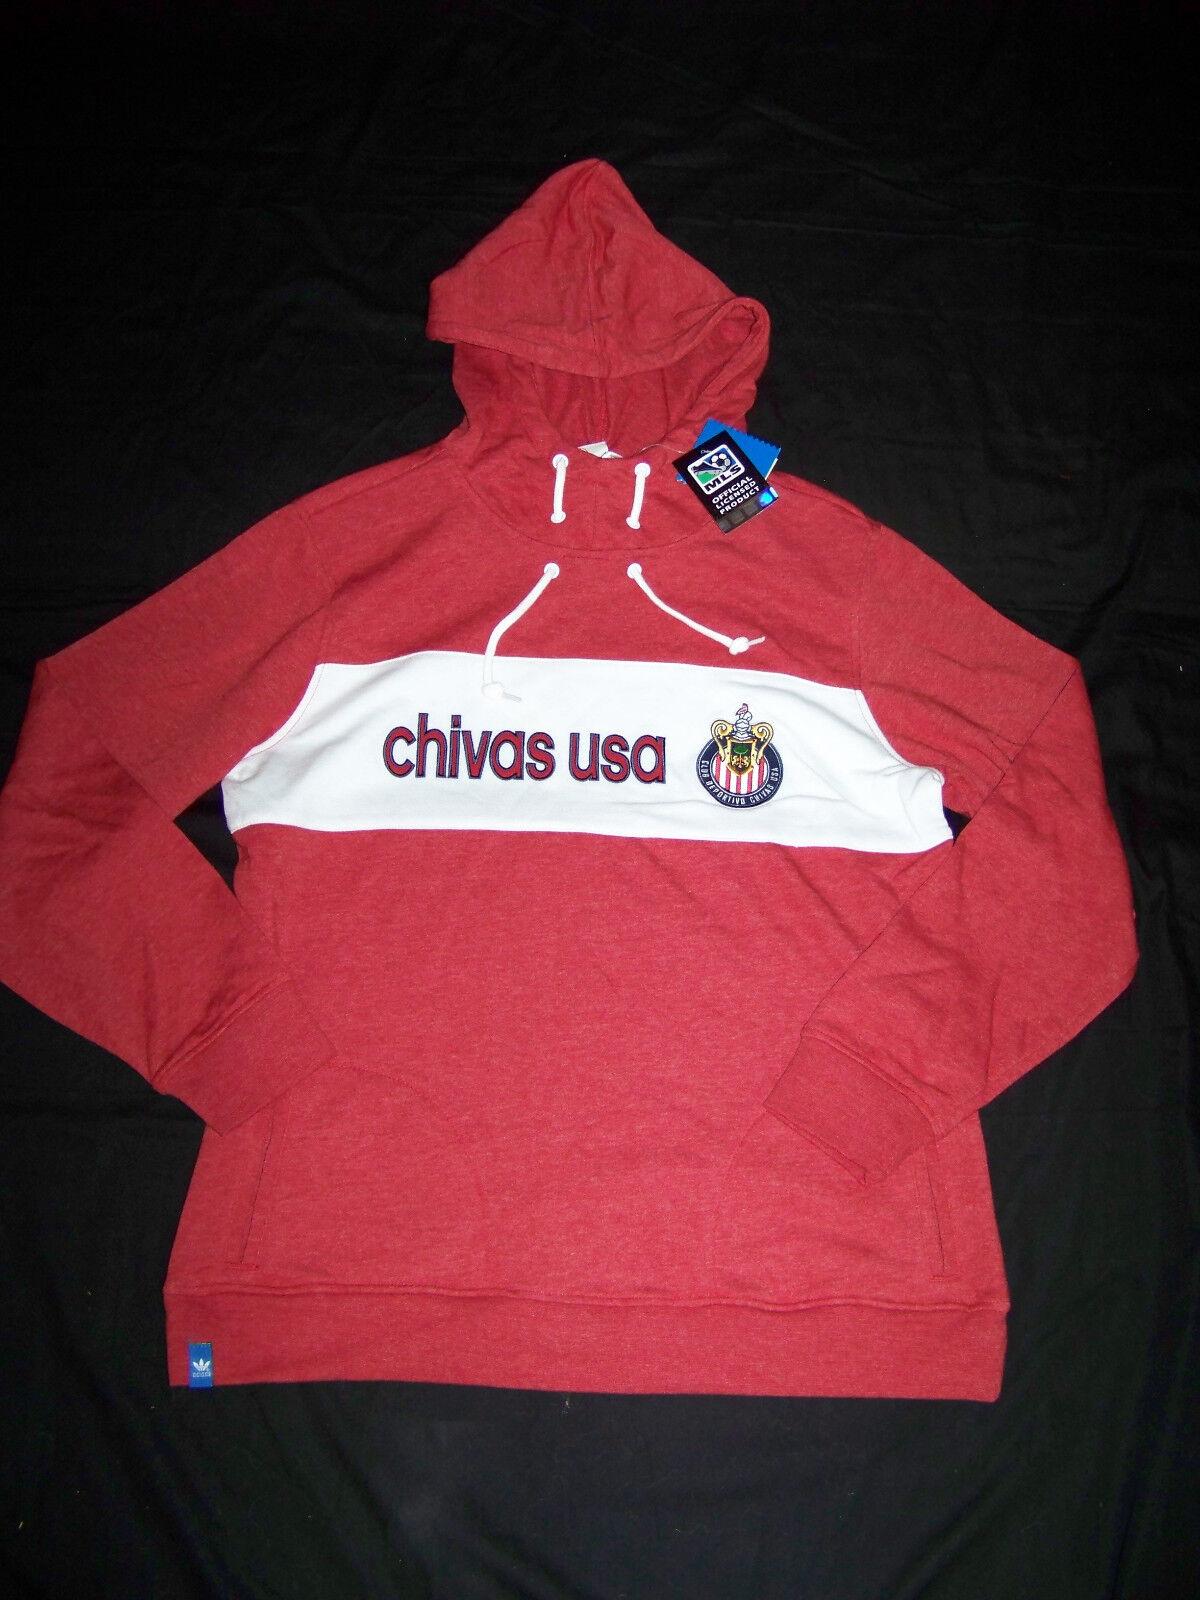 Adidas ΓυναικΡία Λέσχη Deportivo Chivas Ξ—ΞΞ' Hoodie NWT